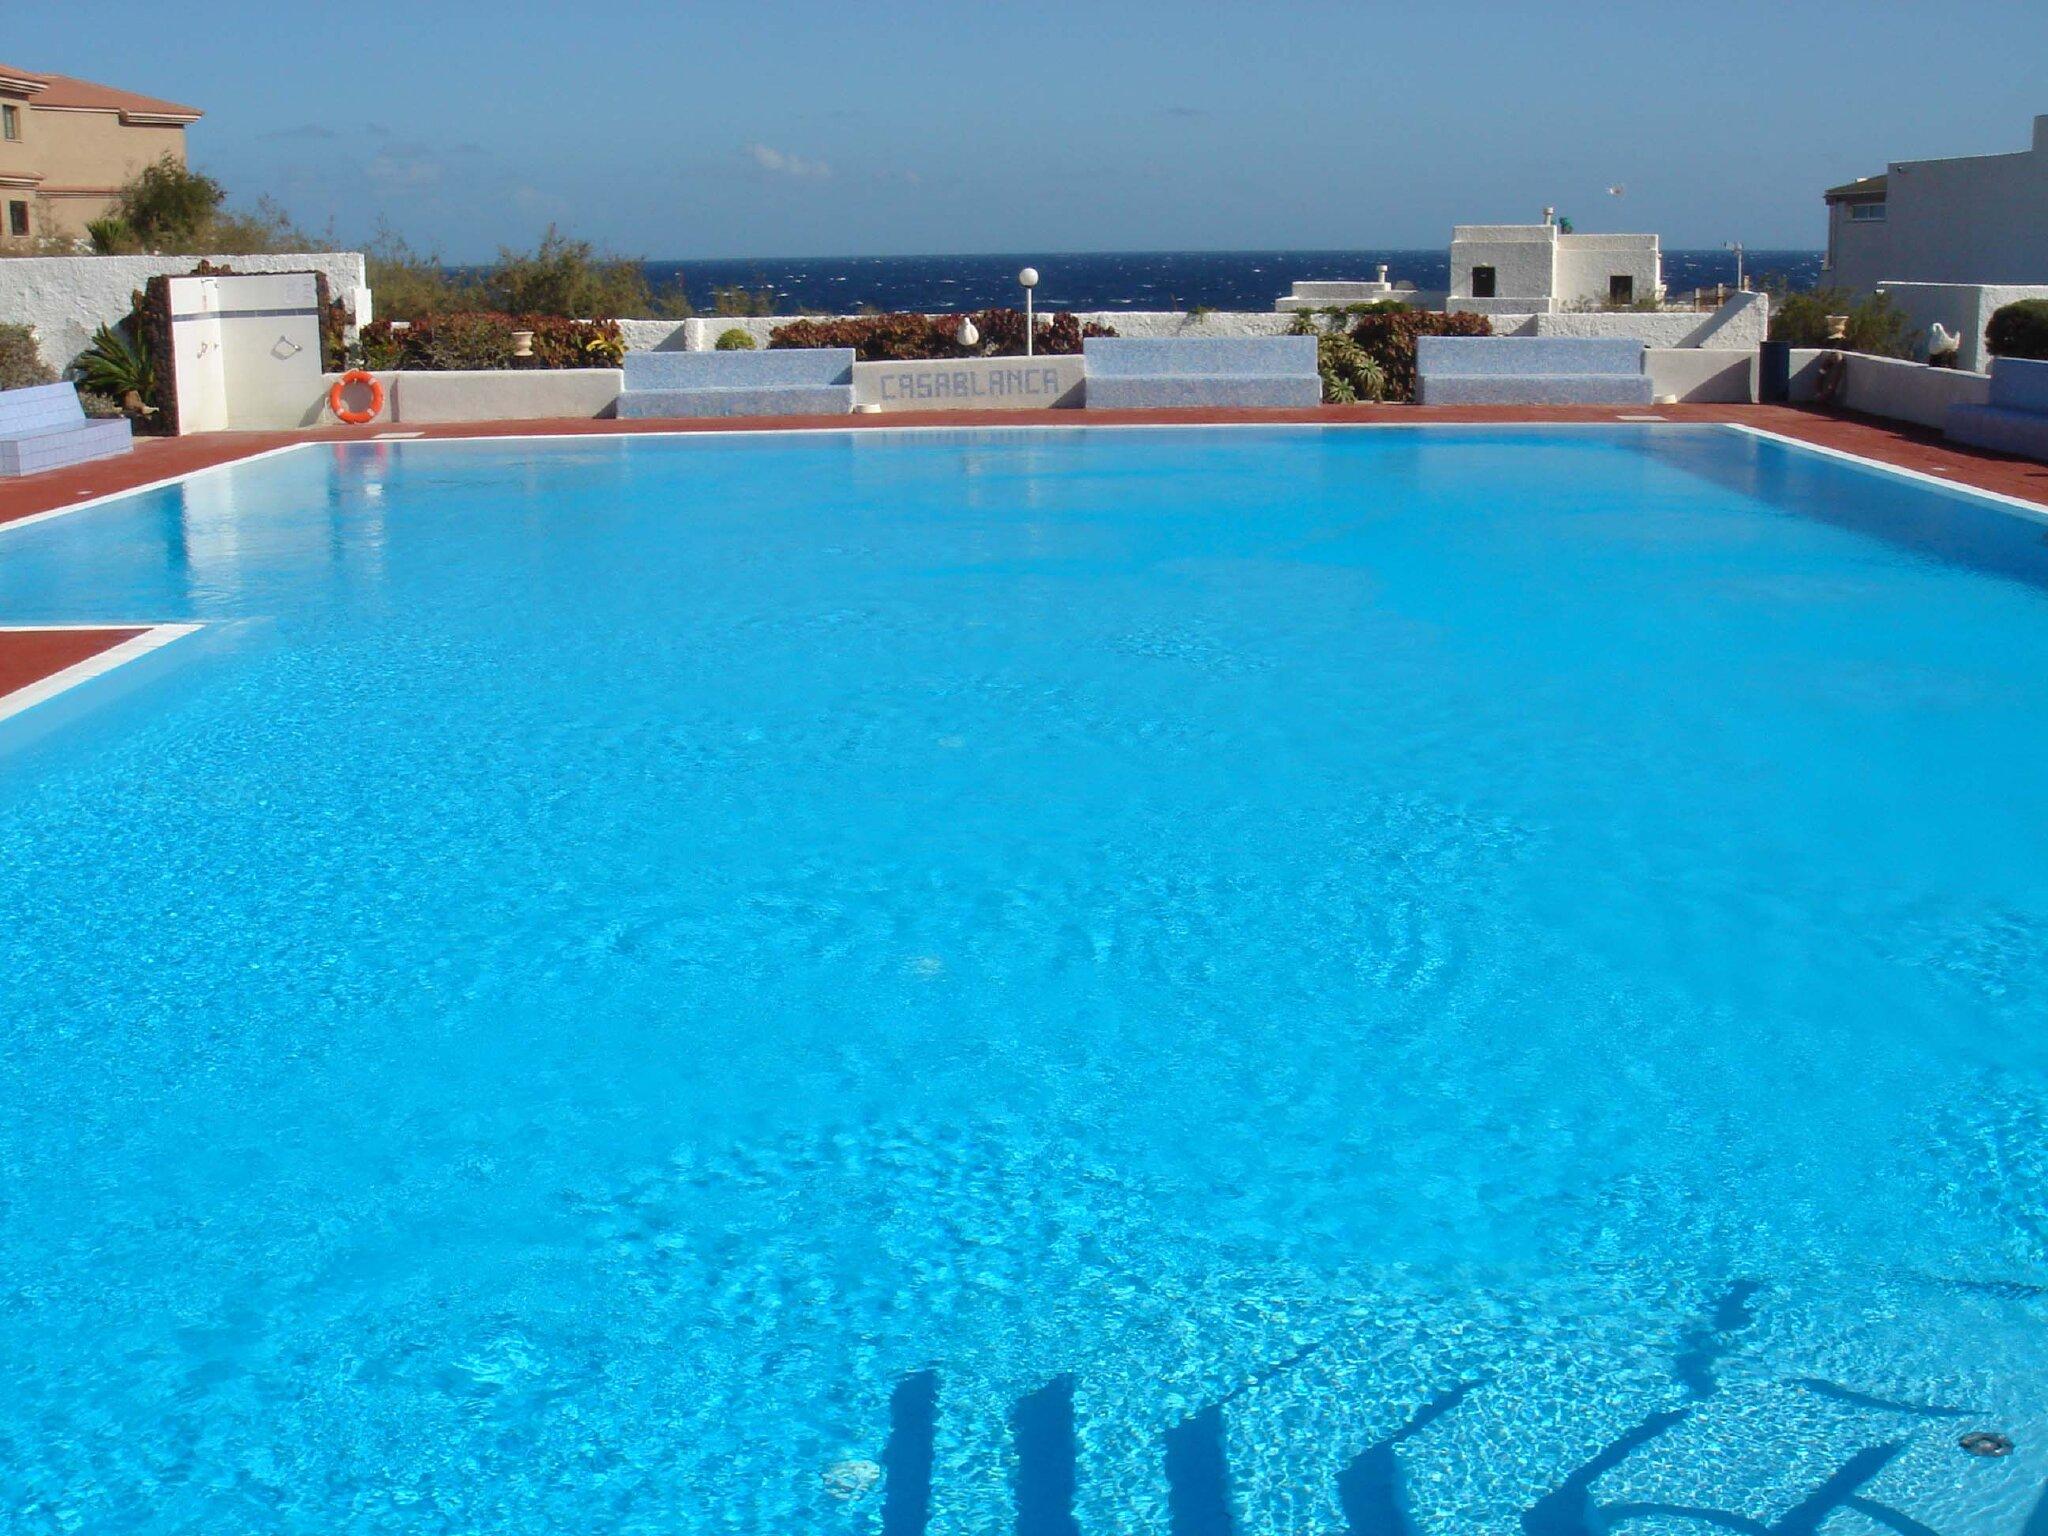 Oberer Pool